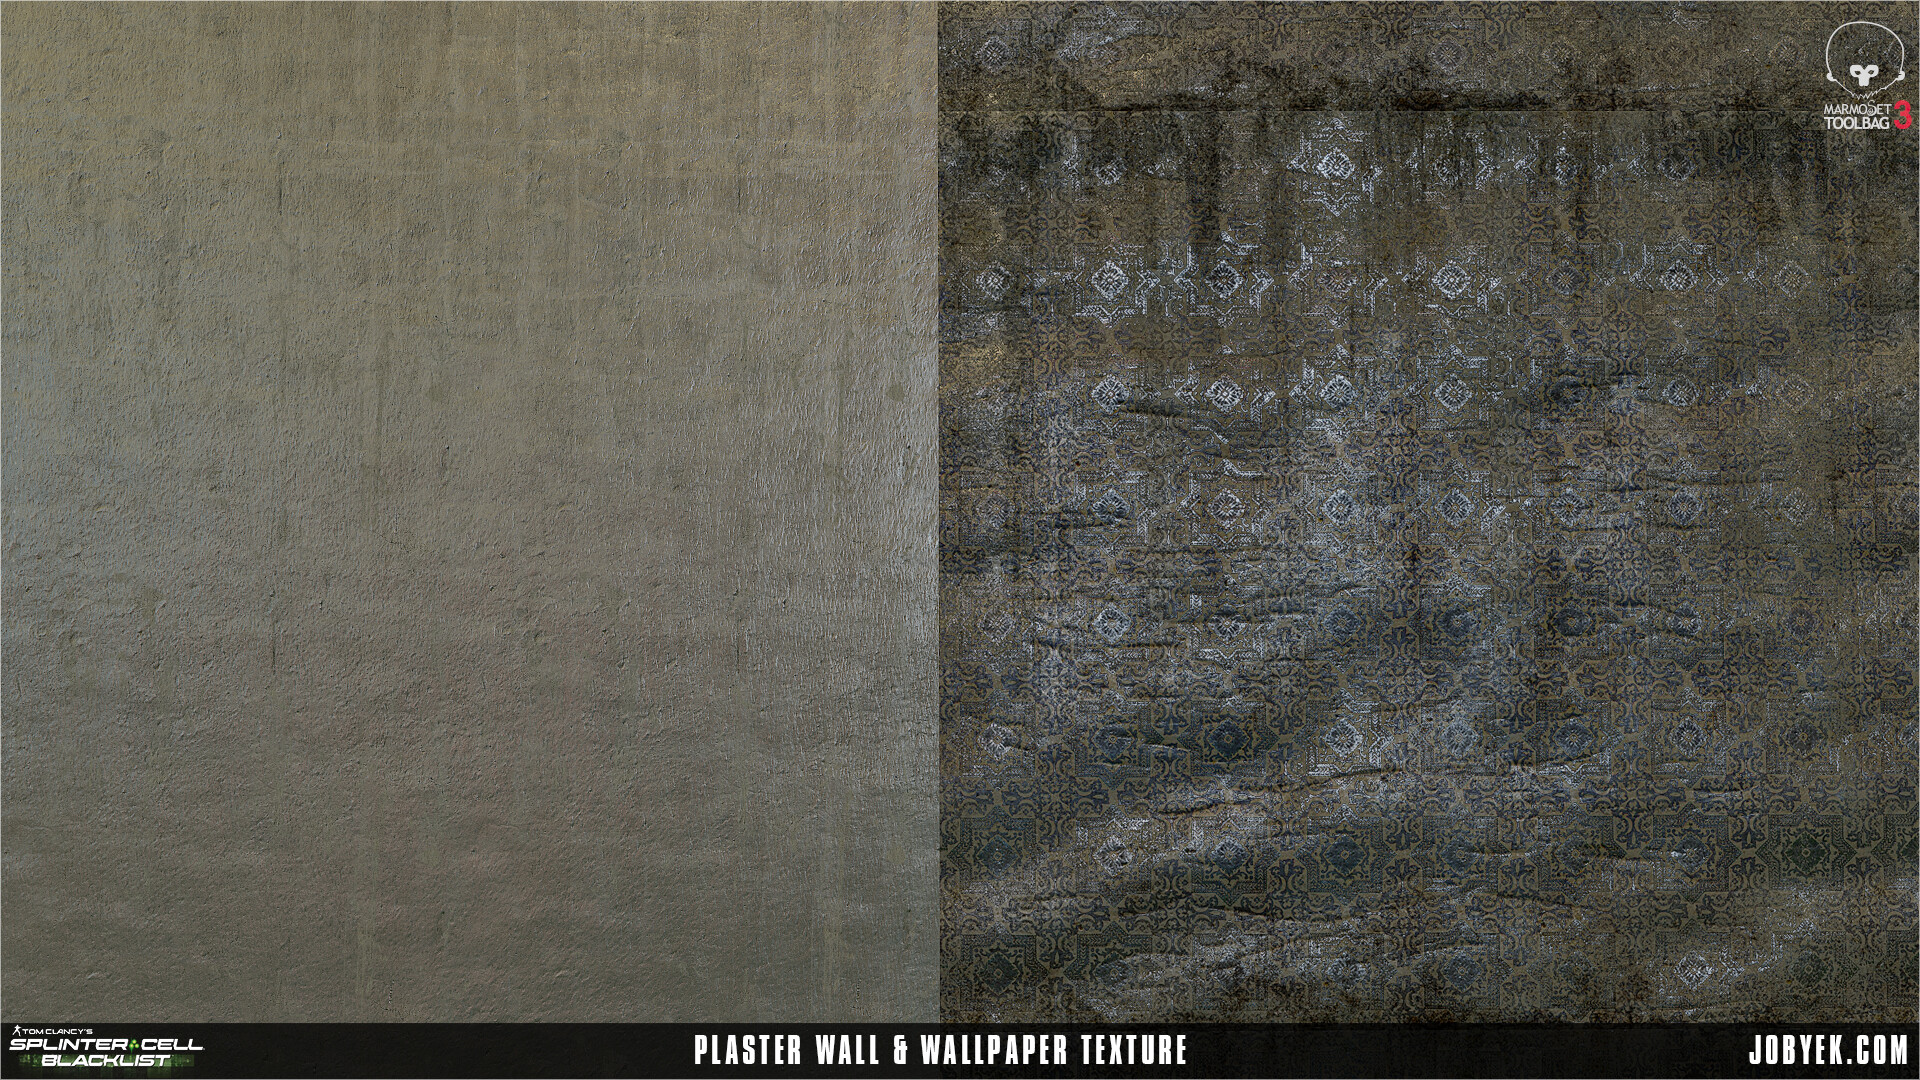 Jobye kyle karmaker scb texture walls 02